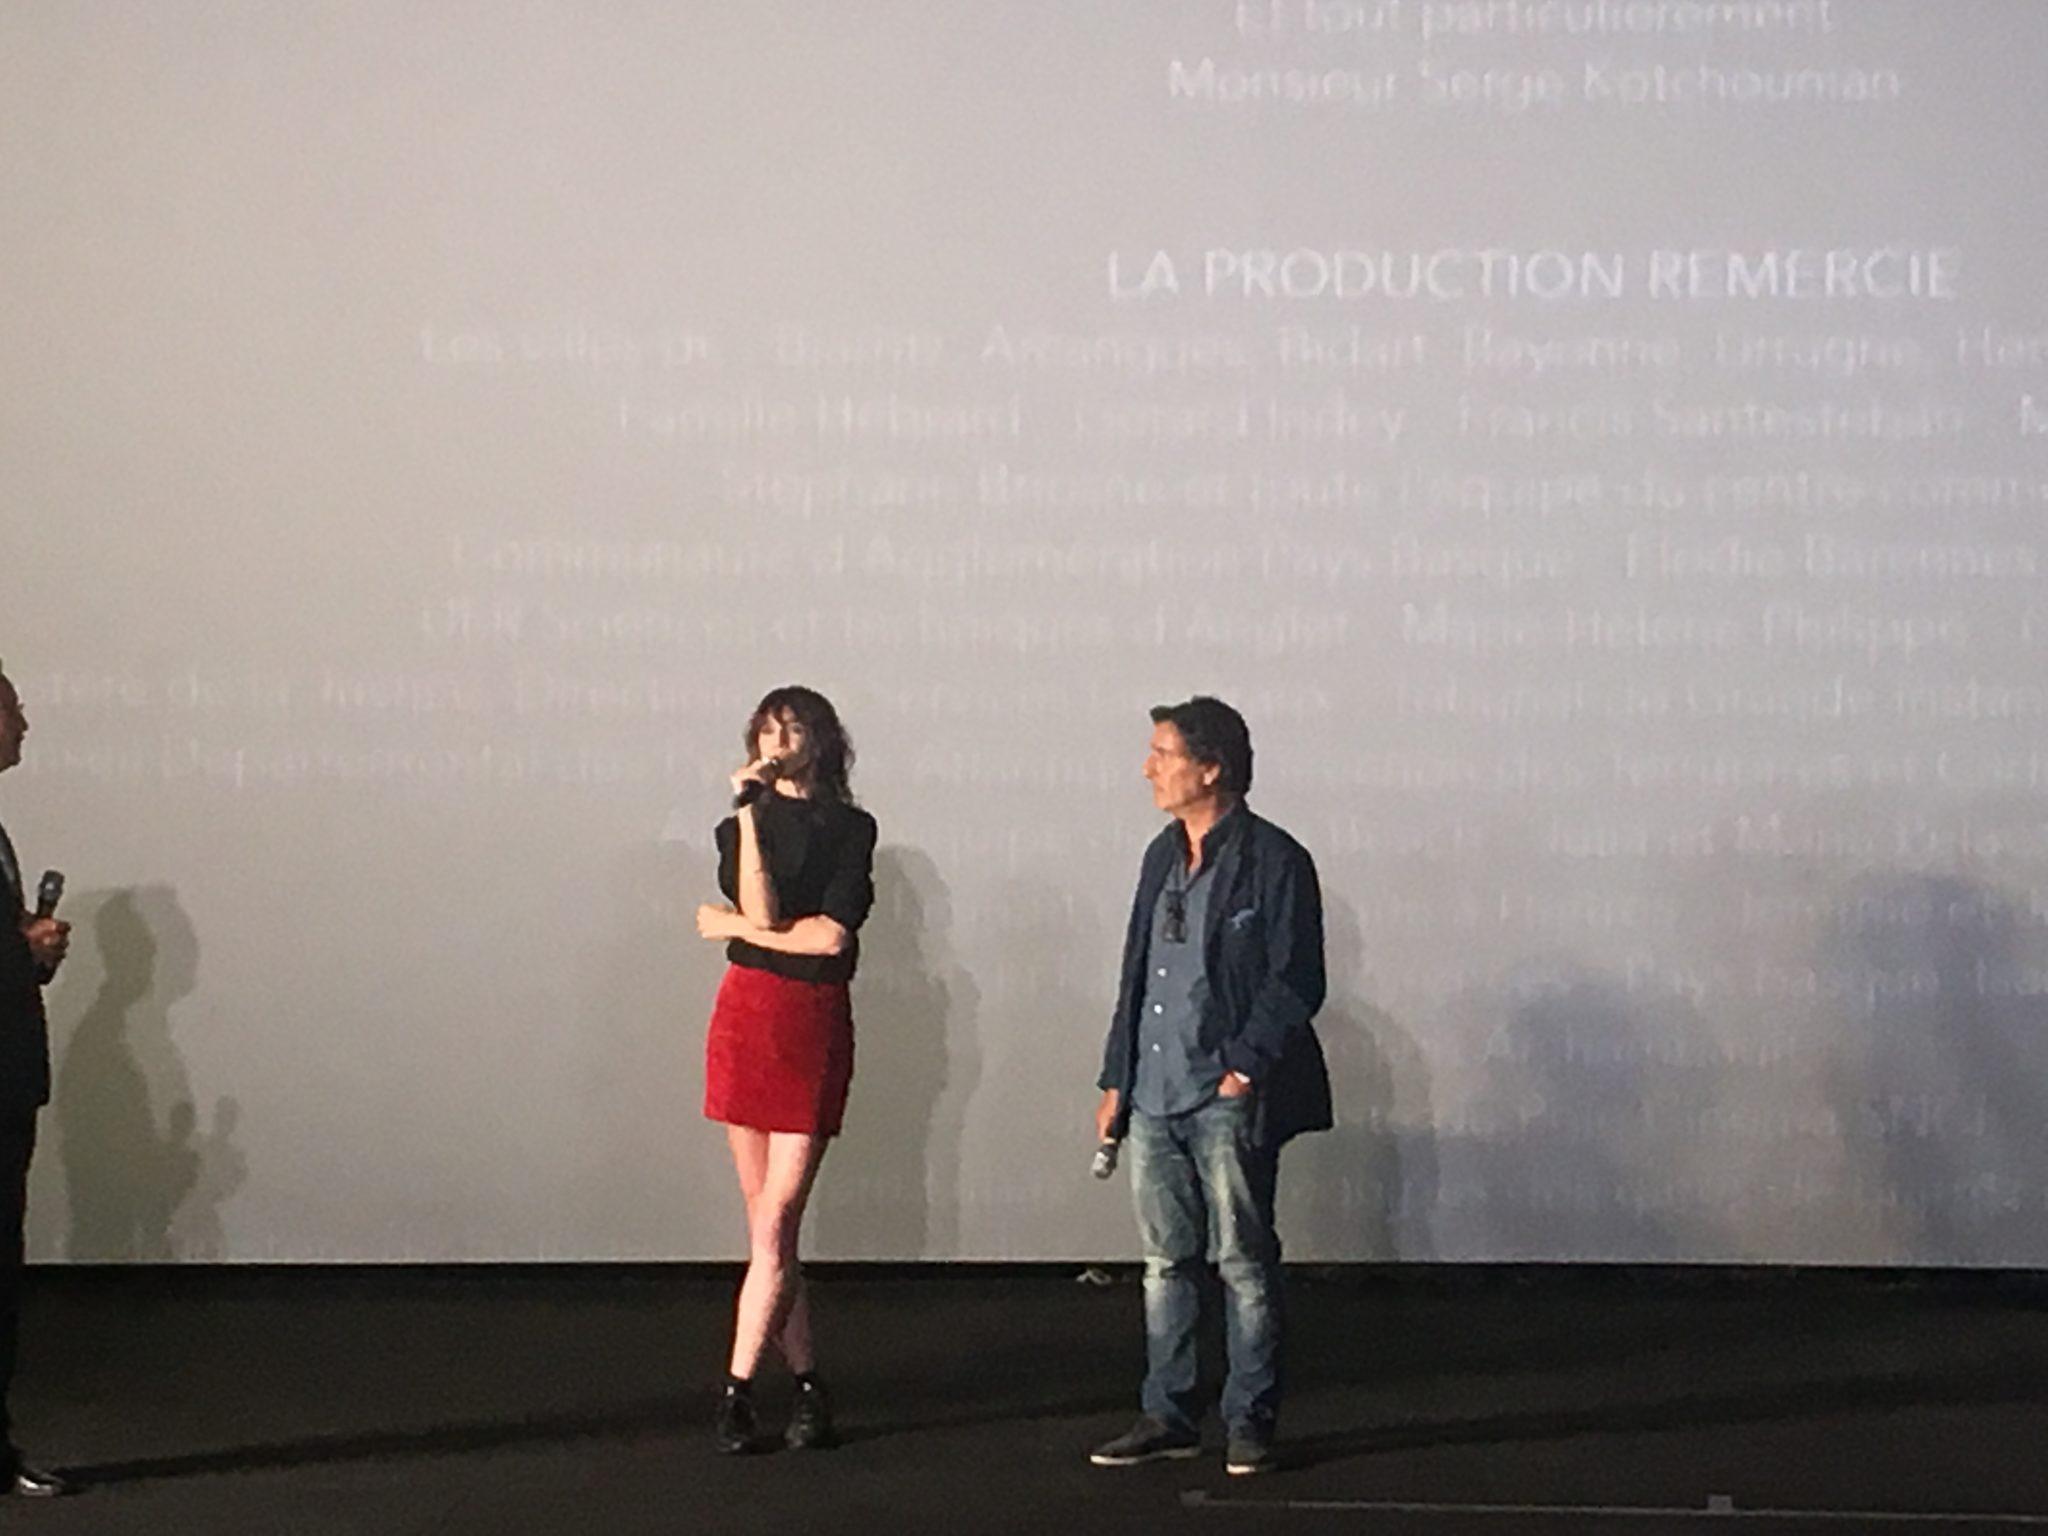 Festival du Film Francophone d'Angoulême Yvan Attal Charlotte Gainsbourg